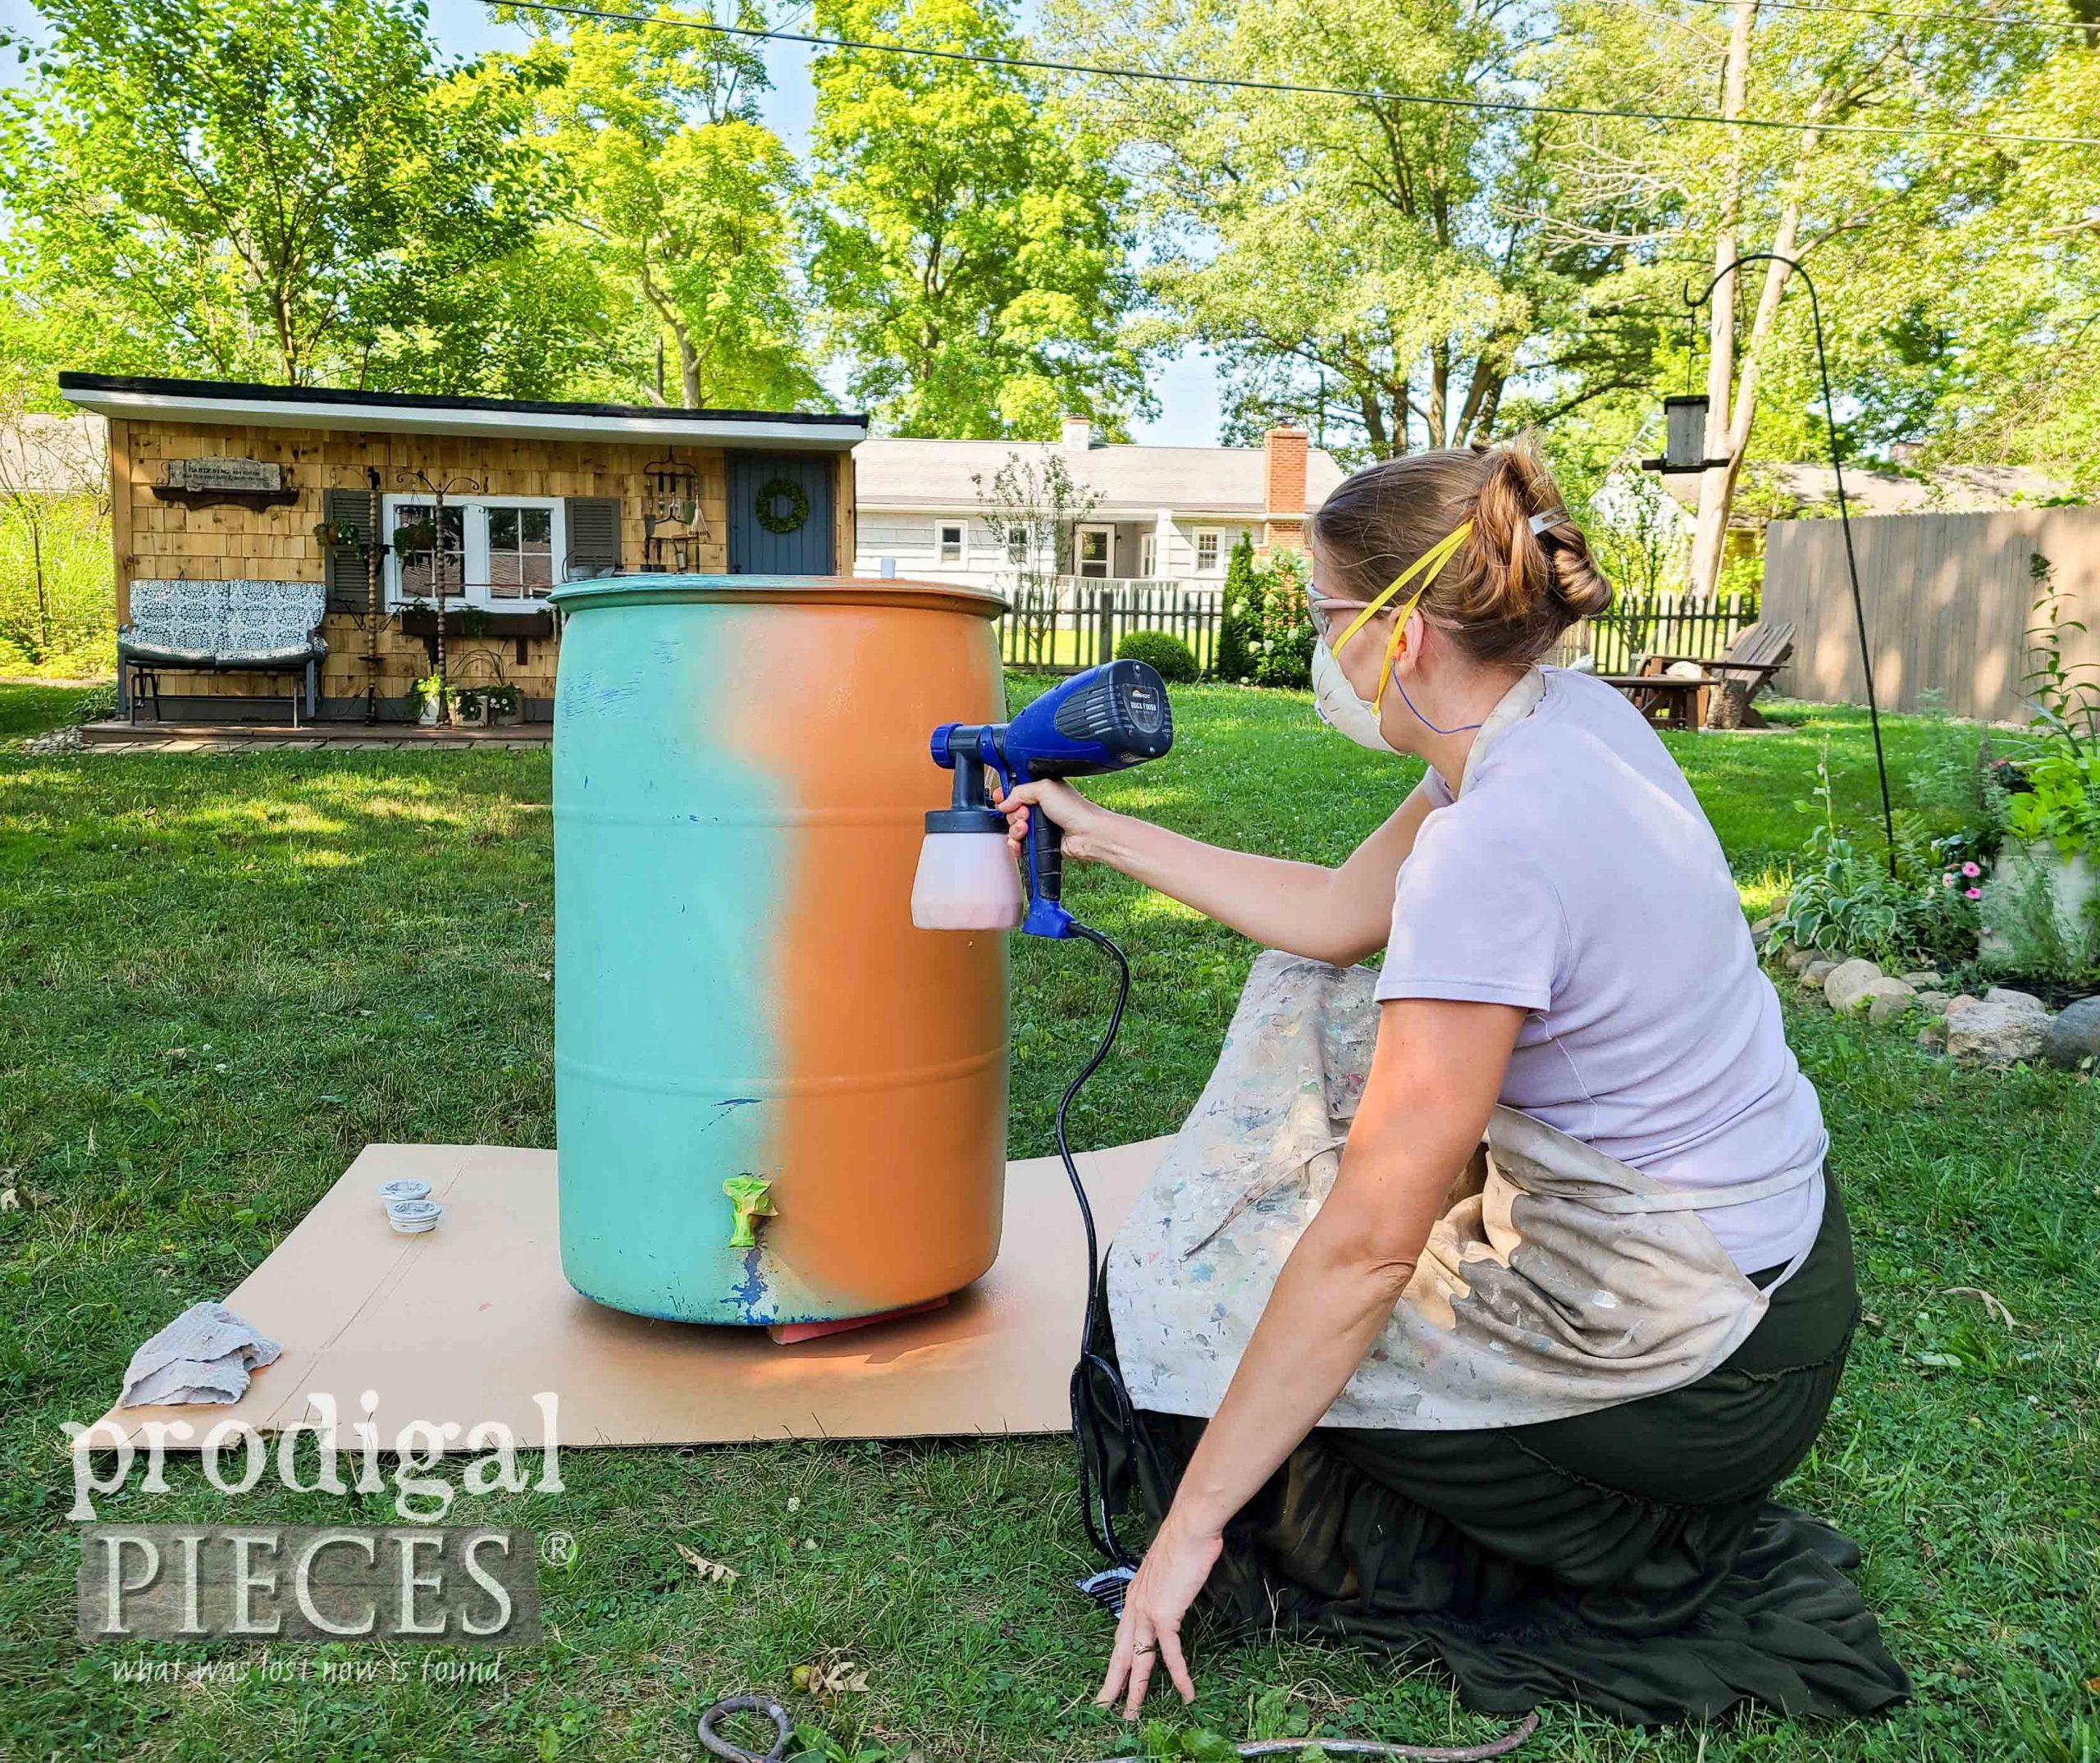 Spray Painting the DIY Rain Barrel with the HomeRight Quick Finish Sprayer | prodigalpieces.com